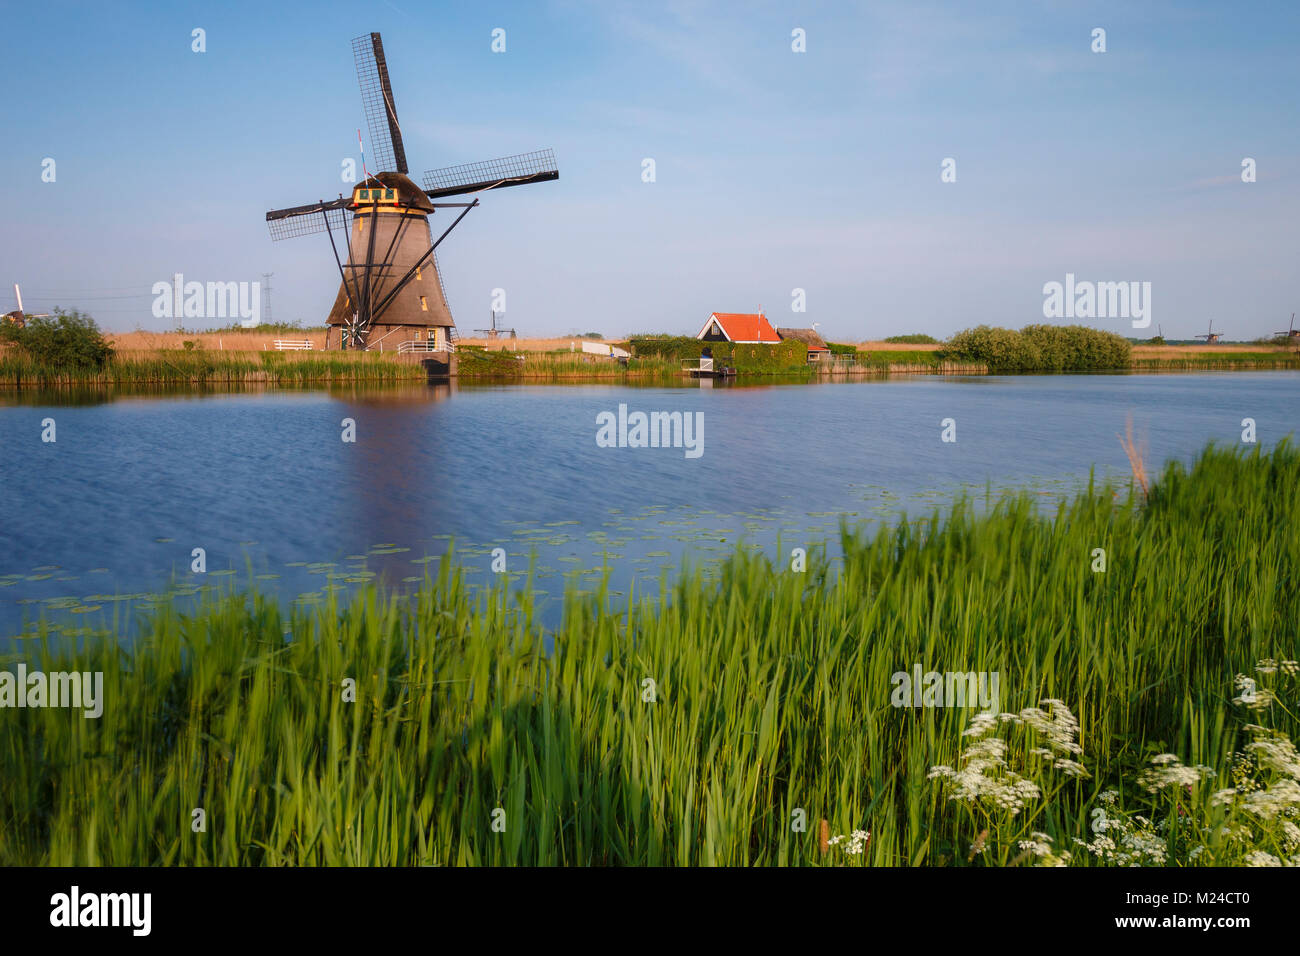 Netherlands kinderdijk historic windmill at a lake - Stock Image